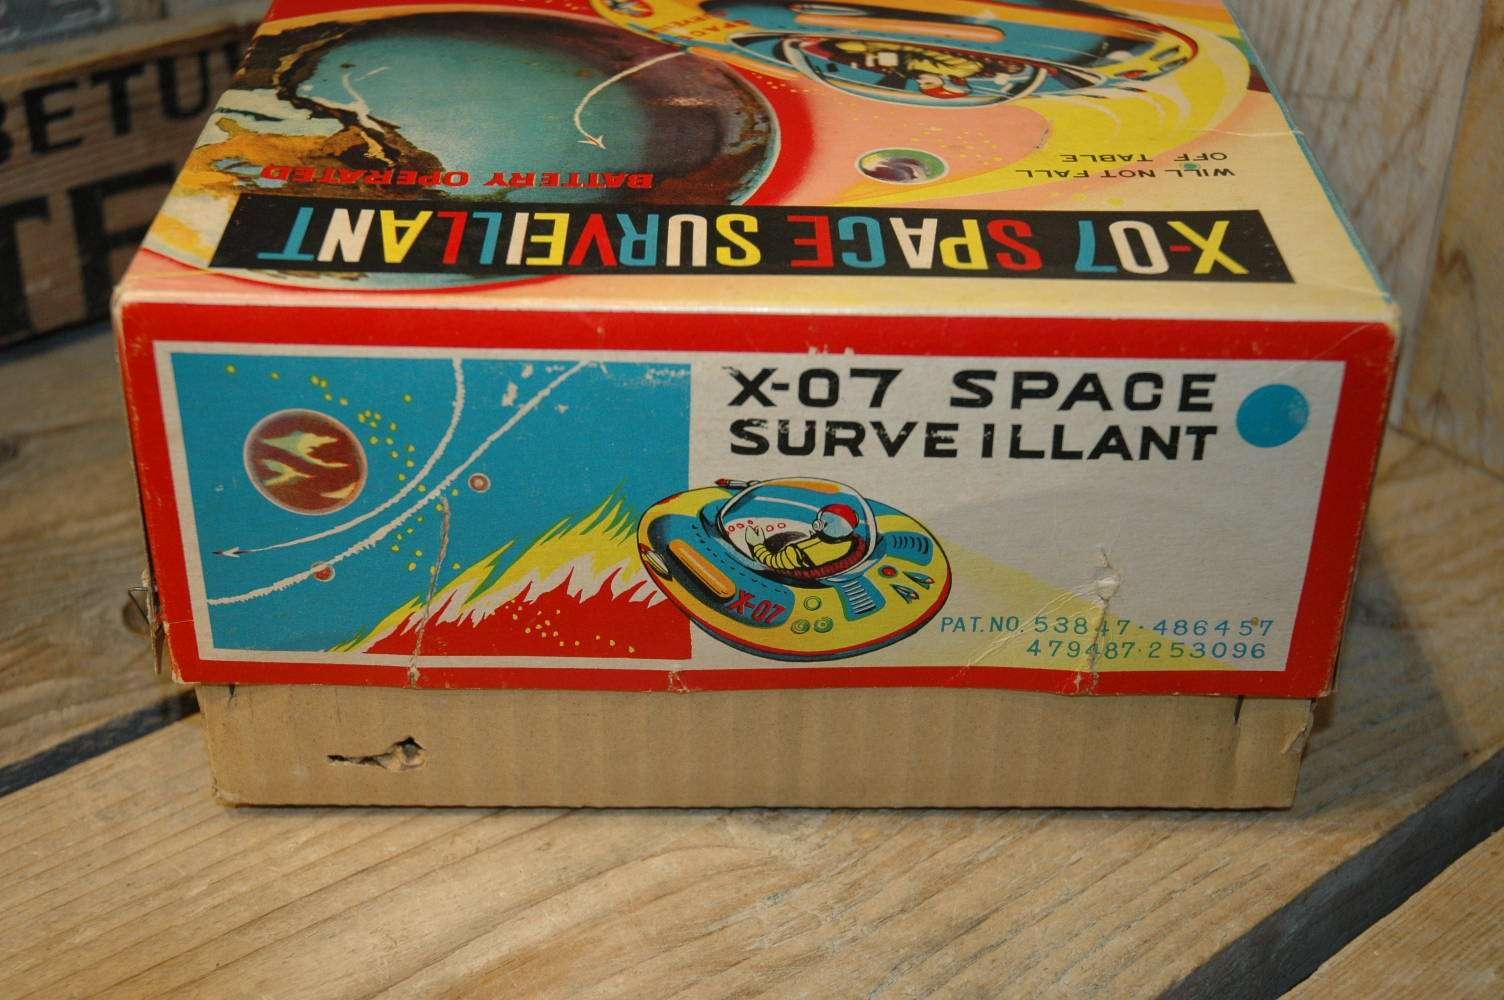 Modern Toys - X-07 Space Surveillant